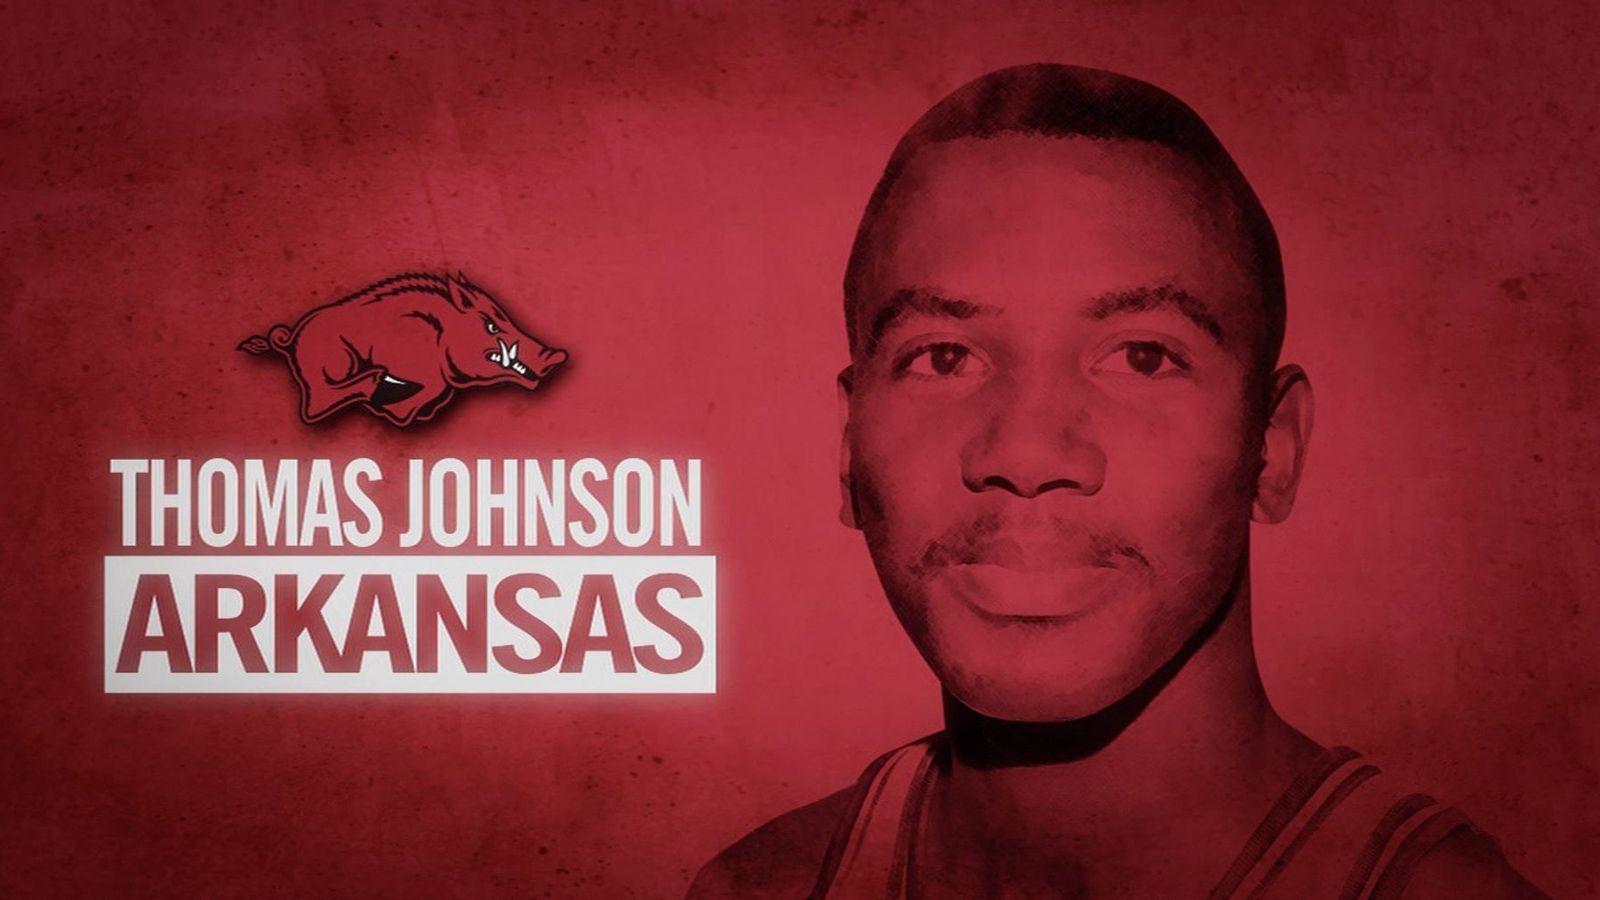 SEC celebrates Black History Month: Arkansas